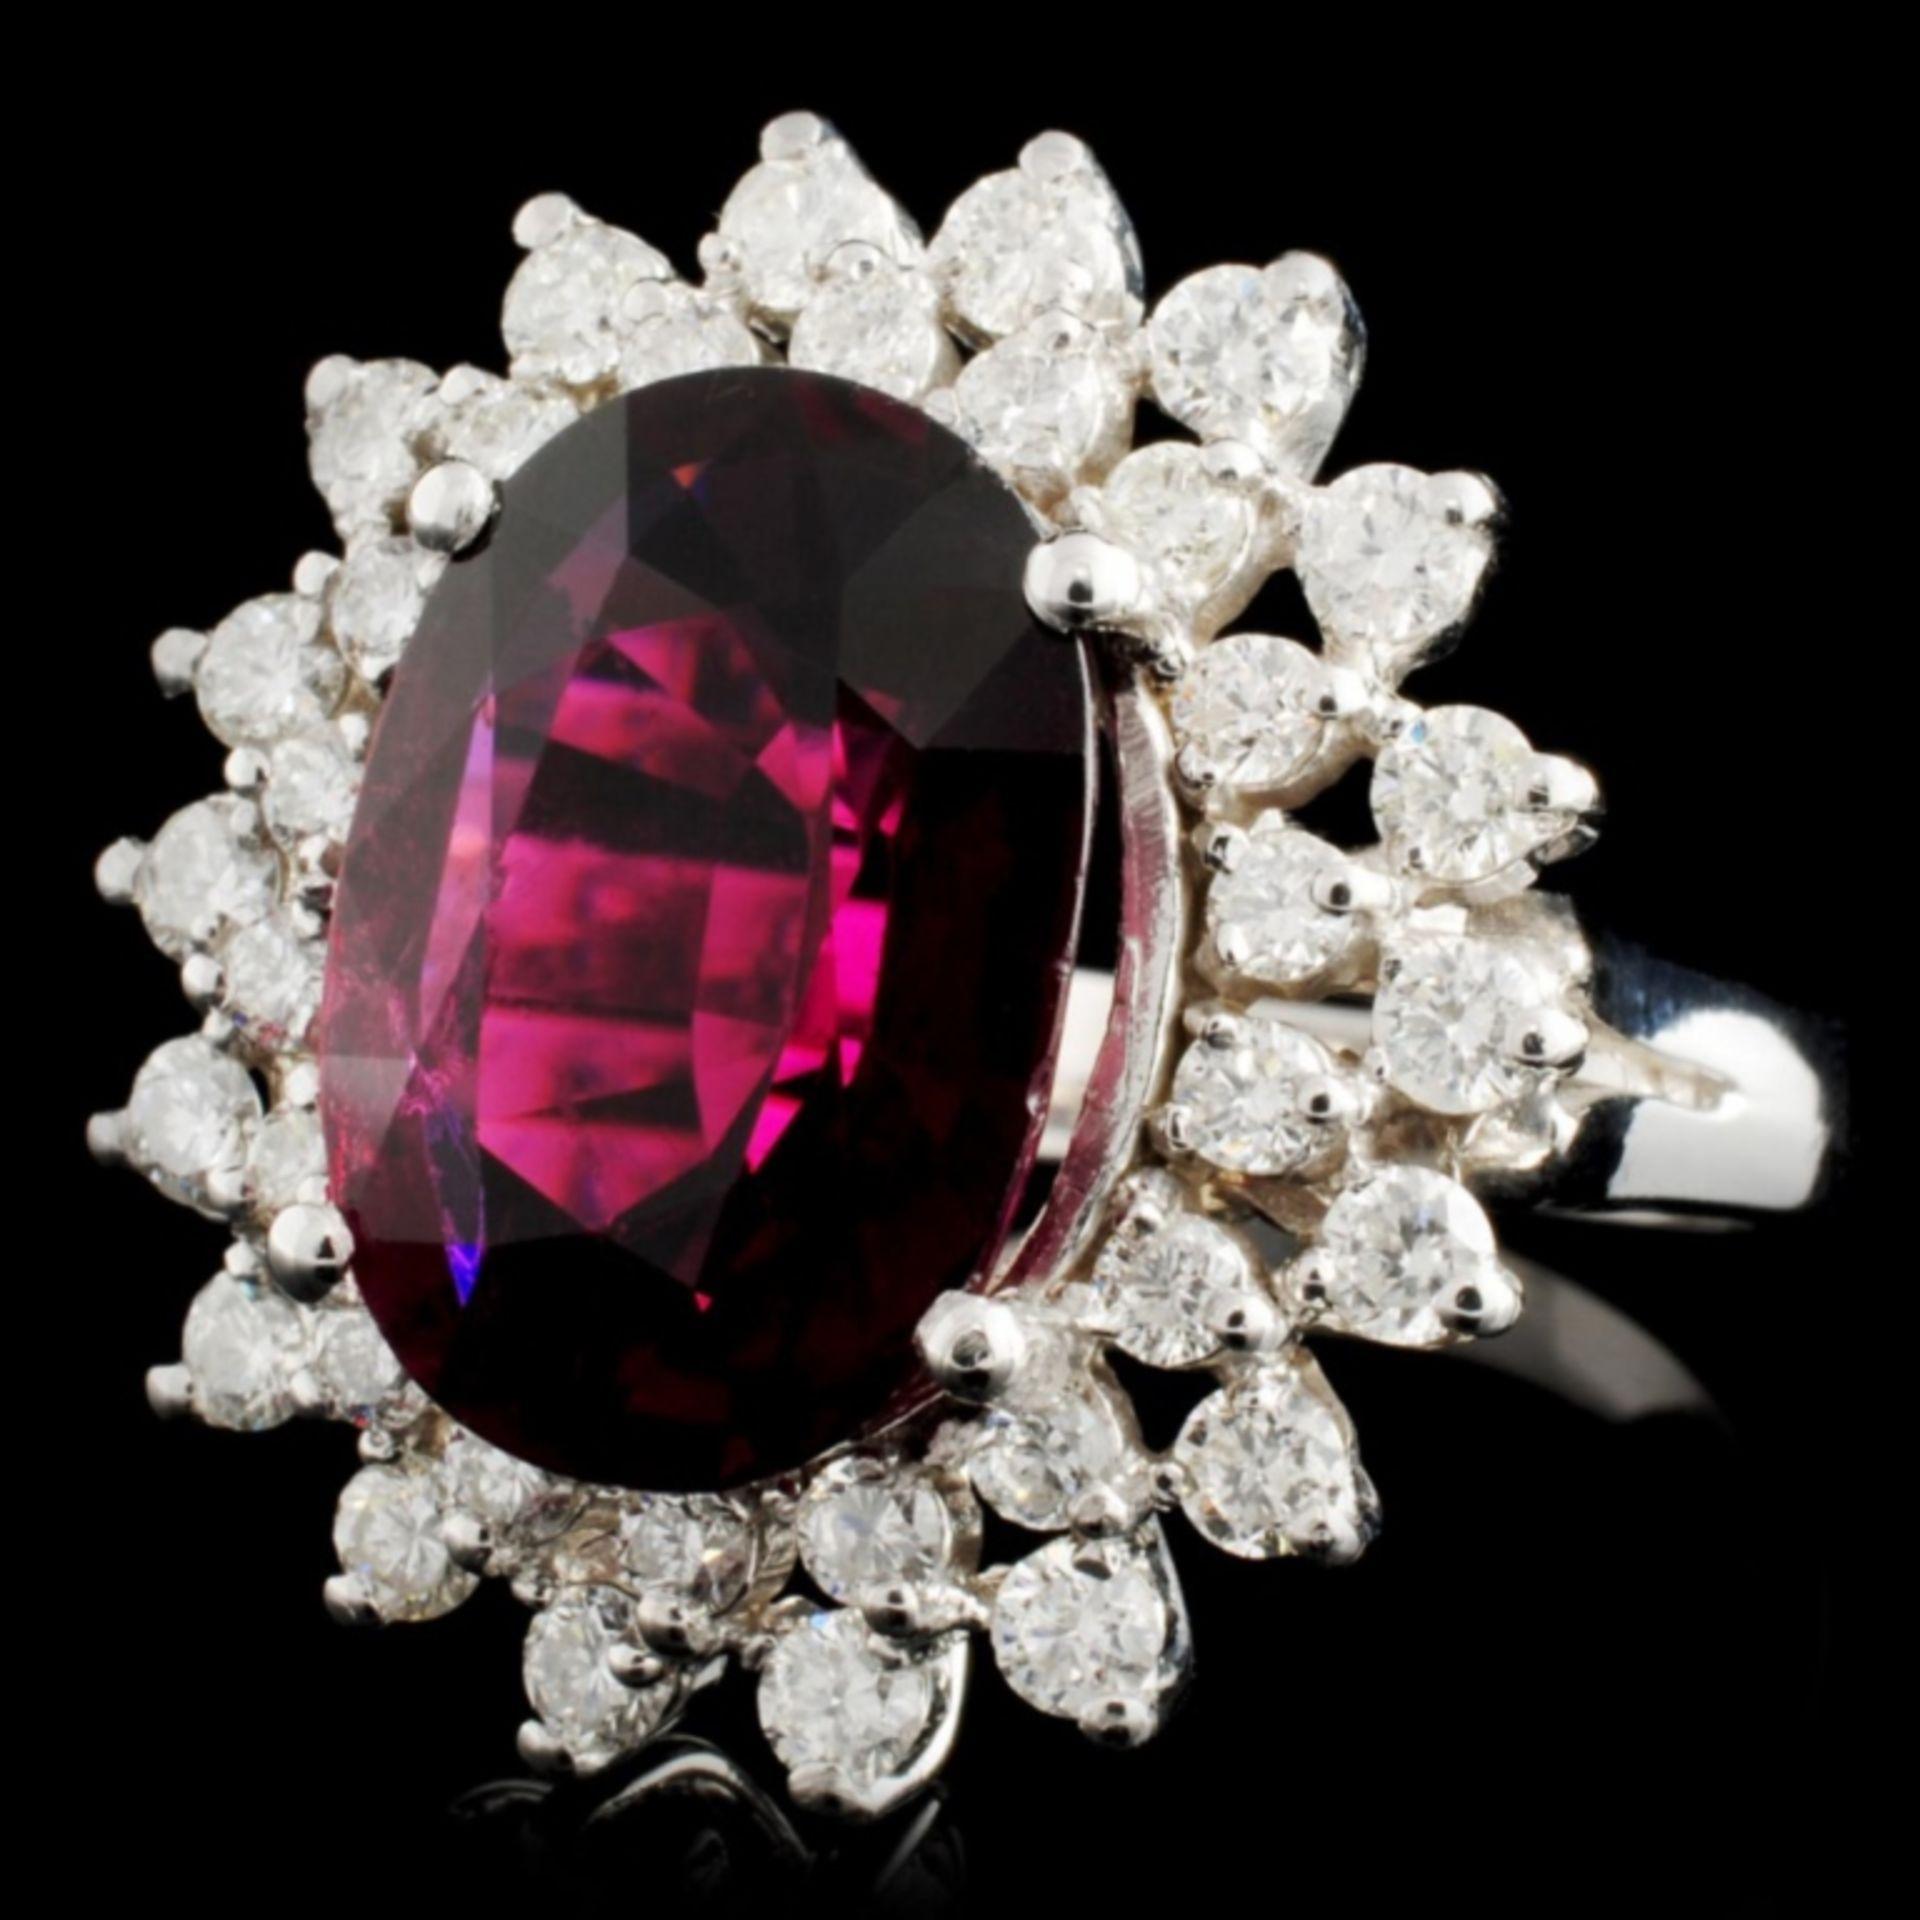 14K Gold 6.40ct Tourmaline & 1.30ctw Diamond Ring - Image 2 of 4